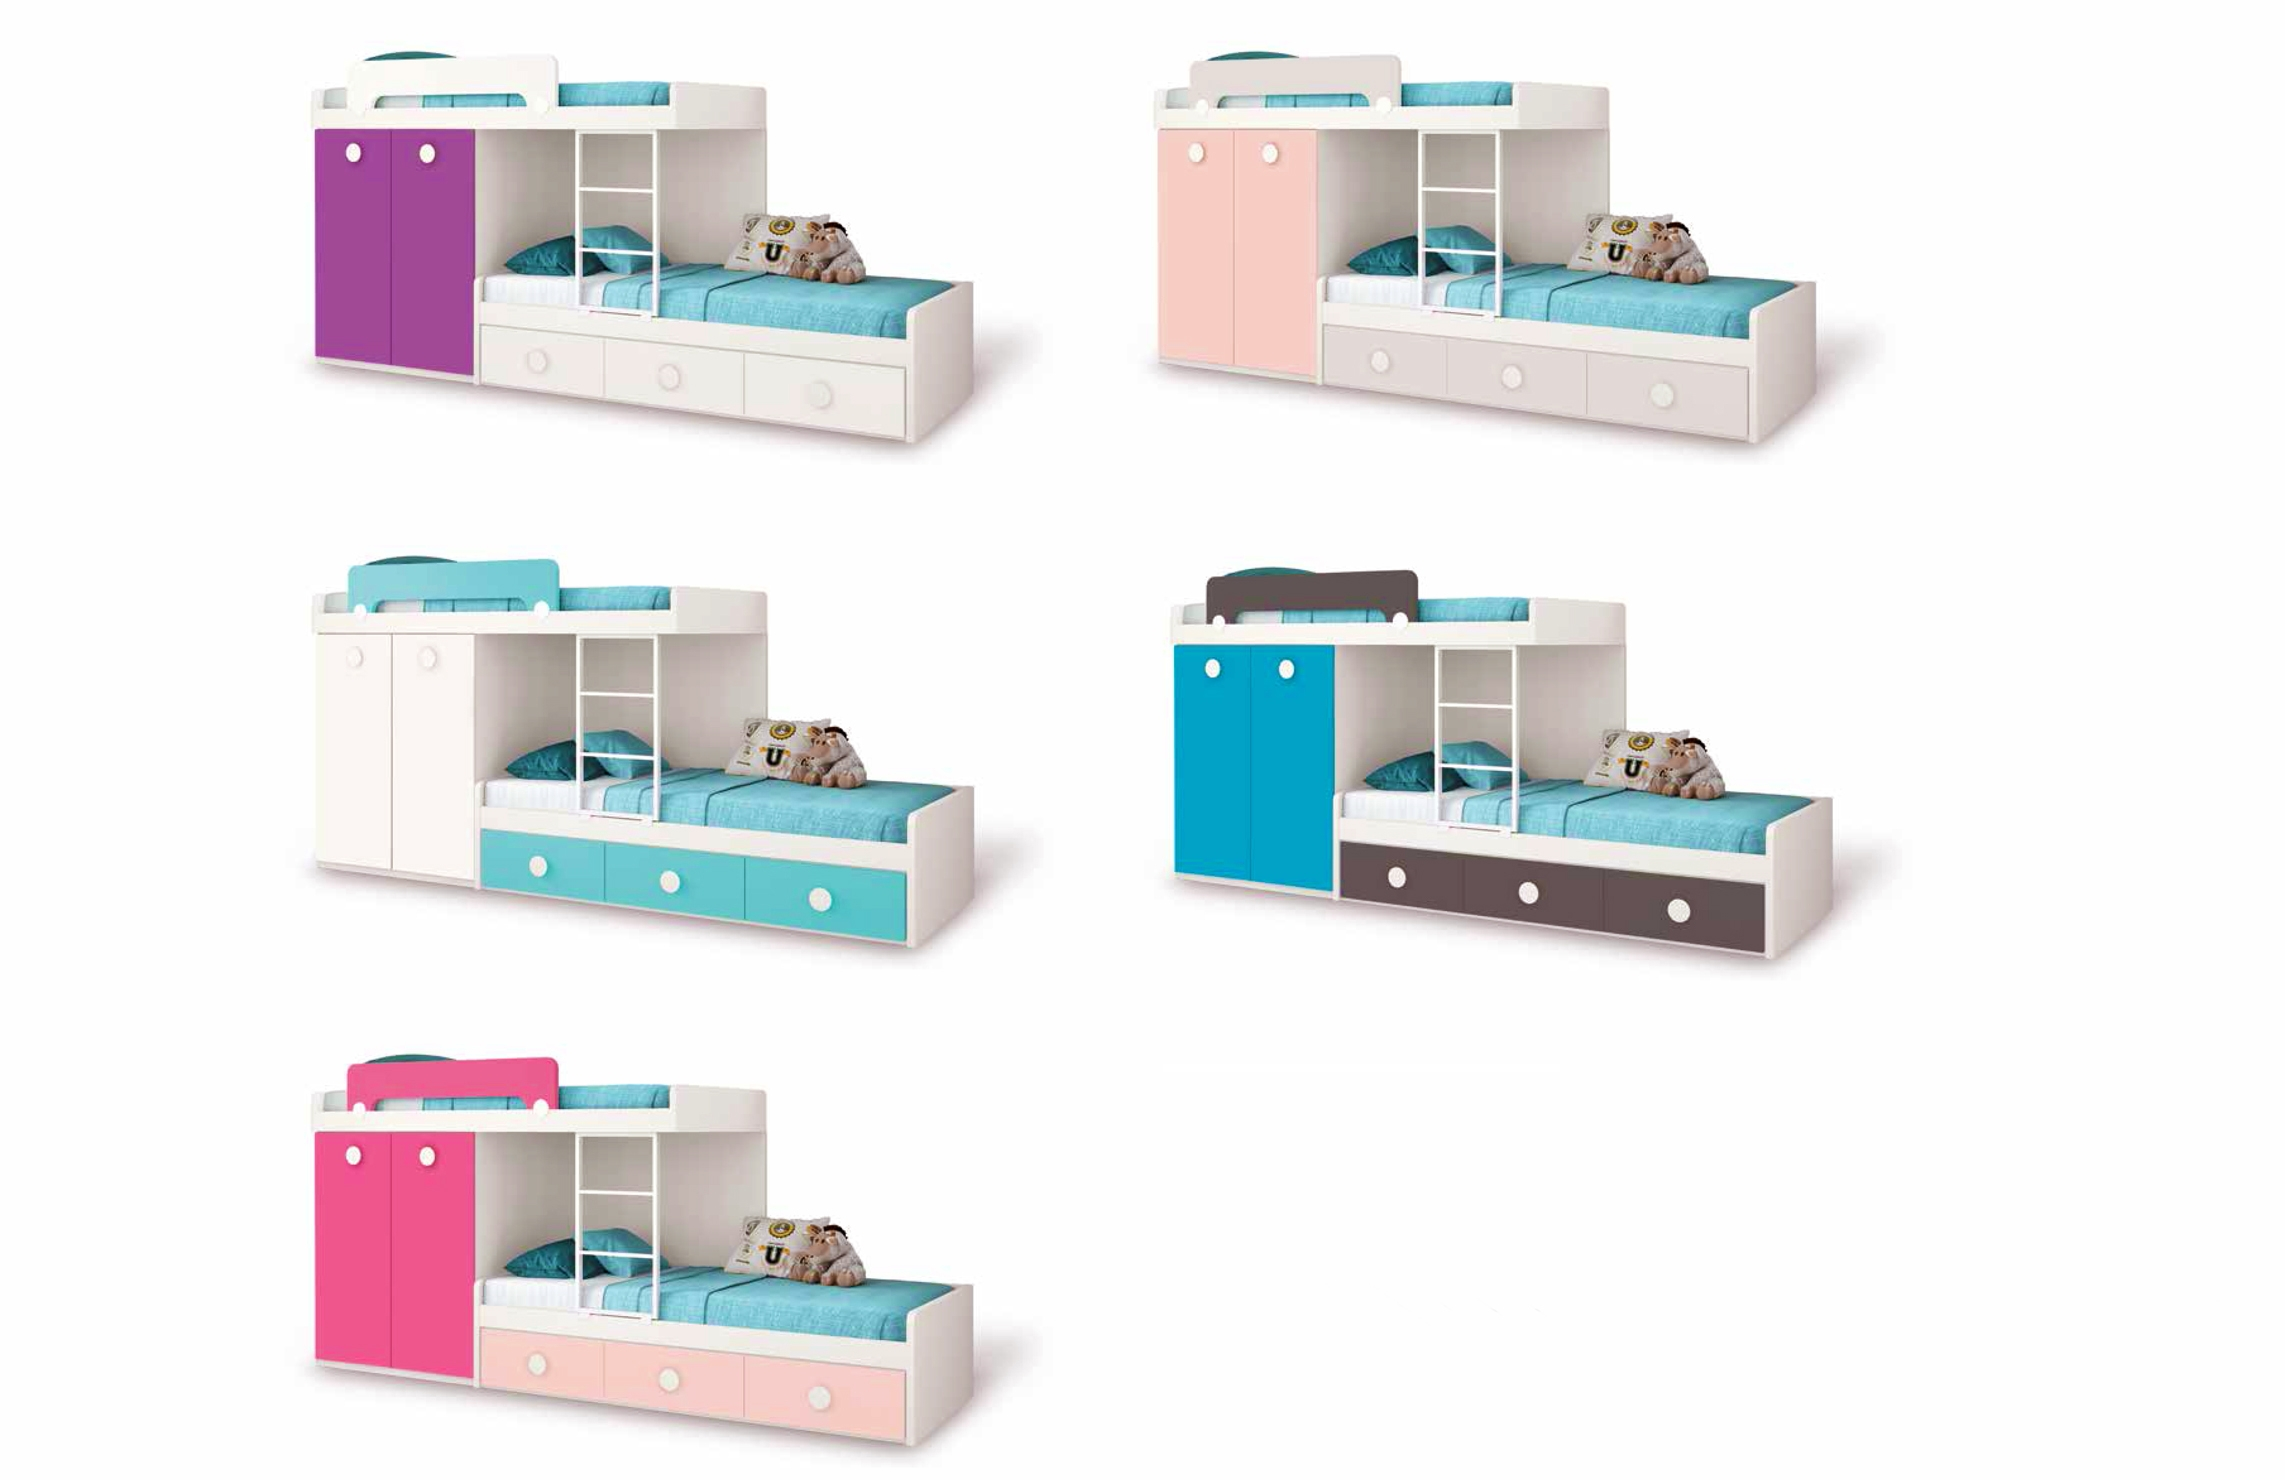 Lits superpos s avec lit gigogne fun et moderne glicerio so nuit - Lit gigogne avec bureau ...